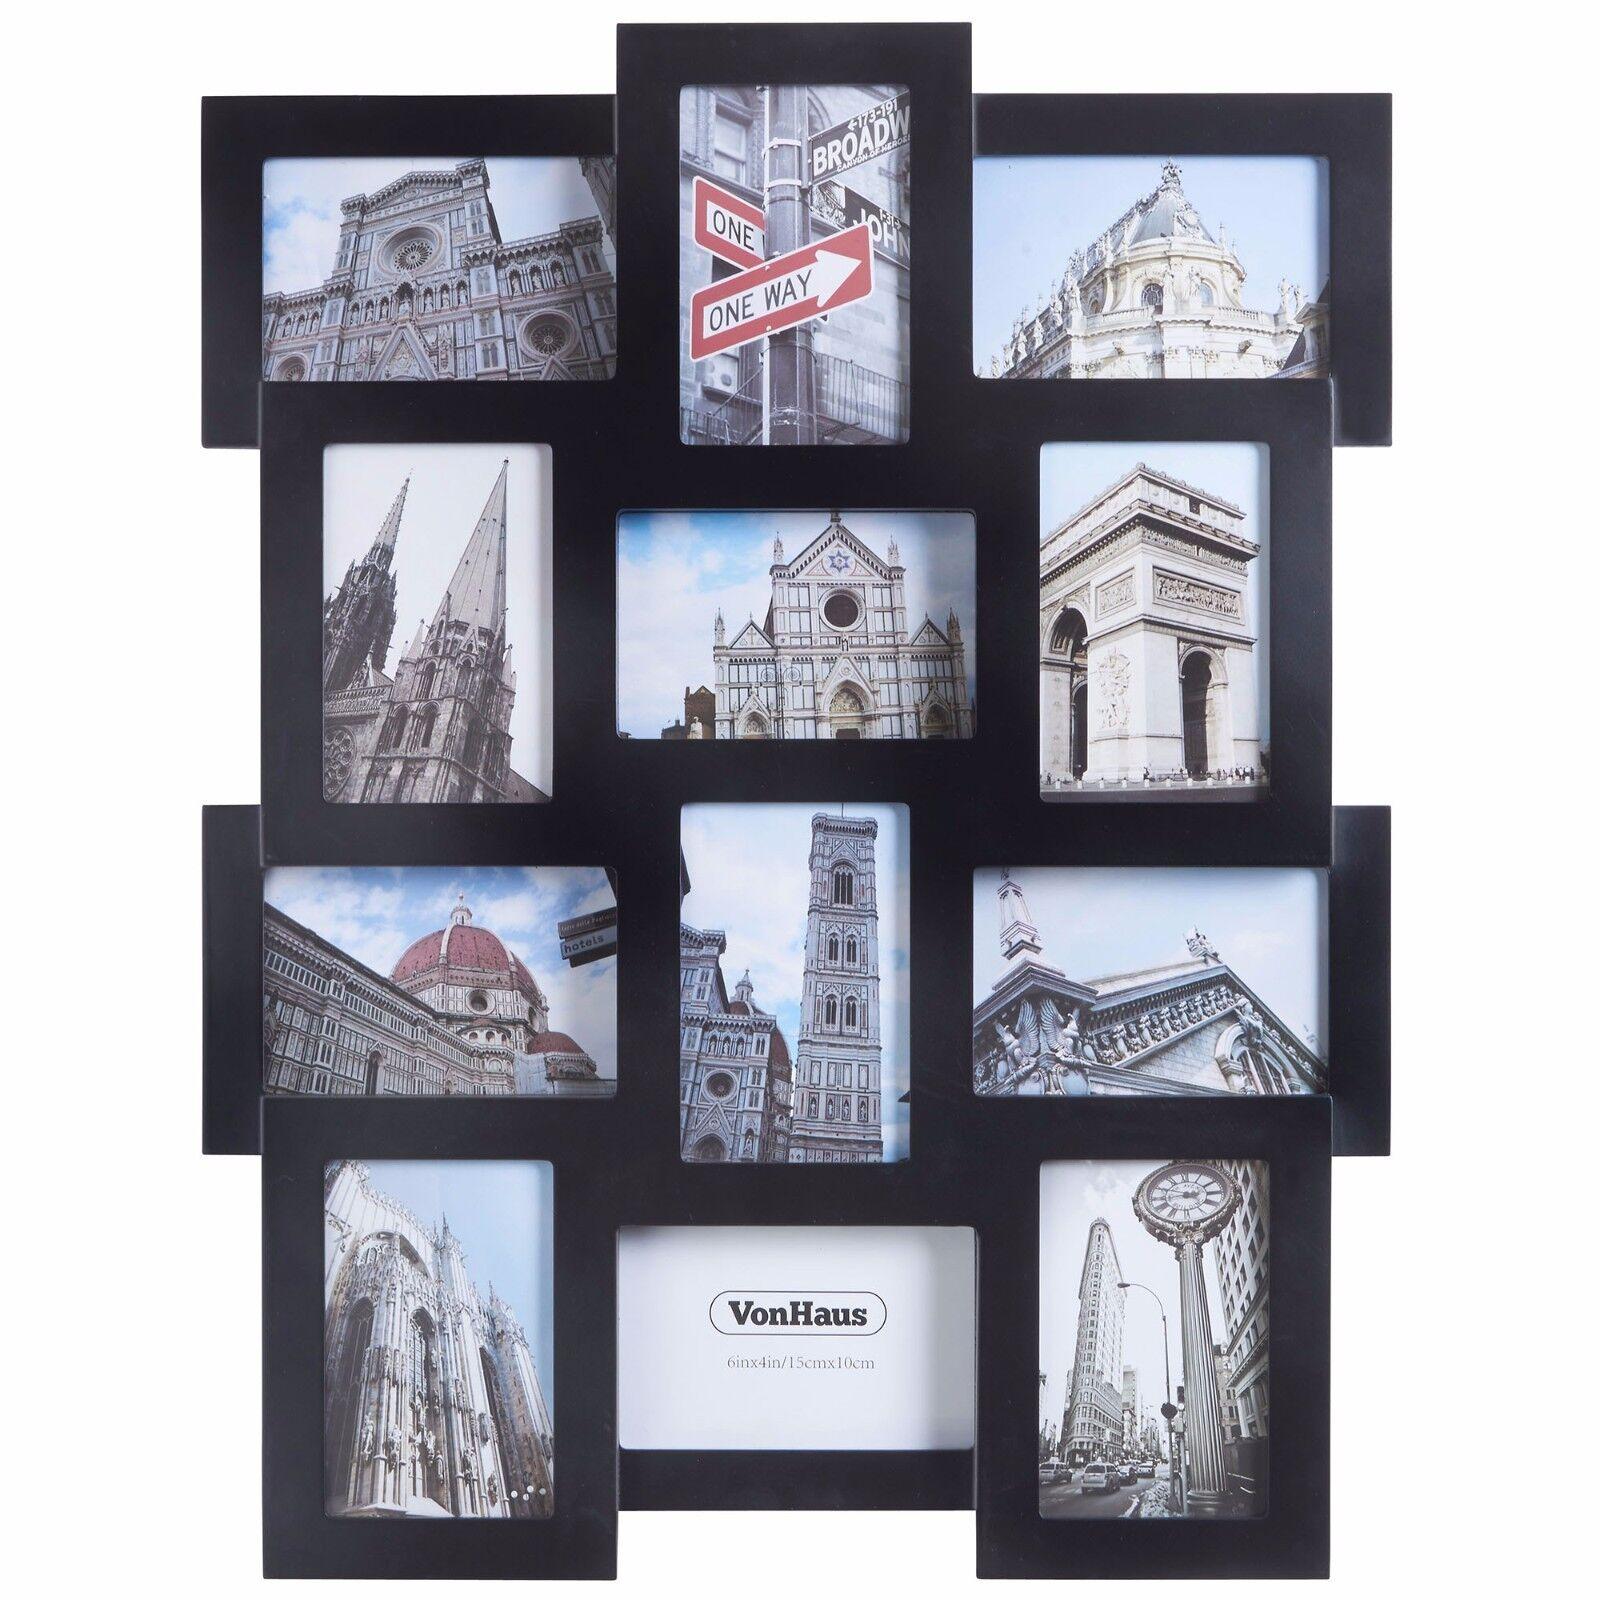 Vonhaus 12 x decorative collage picture frames for multiple 4x6 picture 1 of 4 jeuxipadfo Images